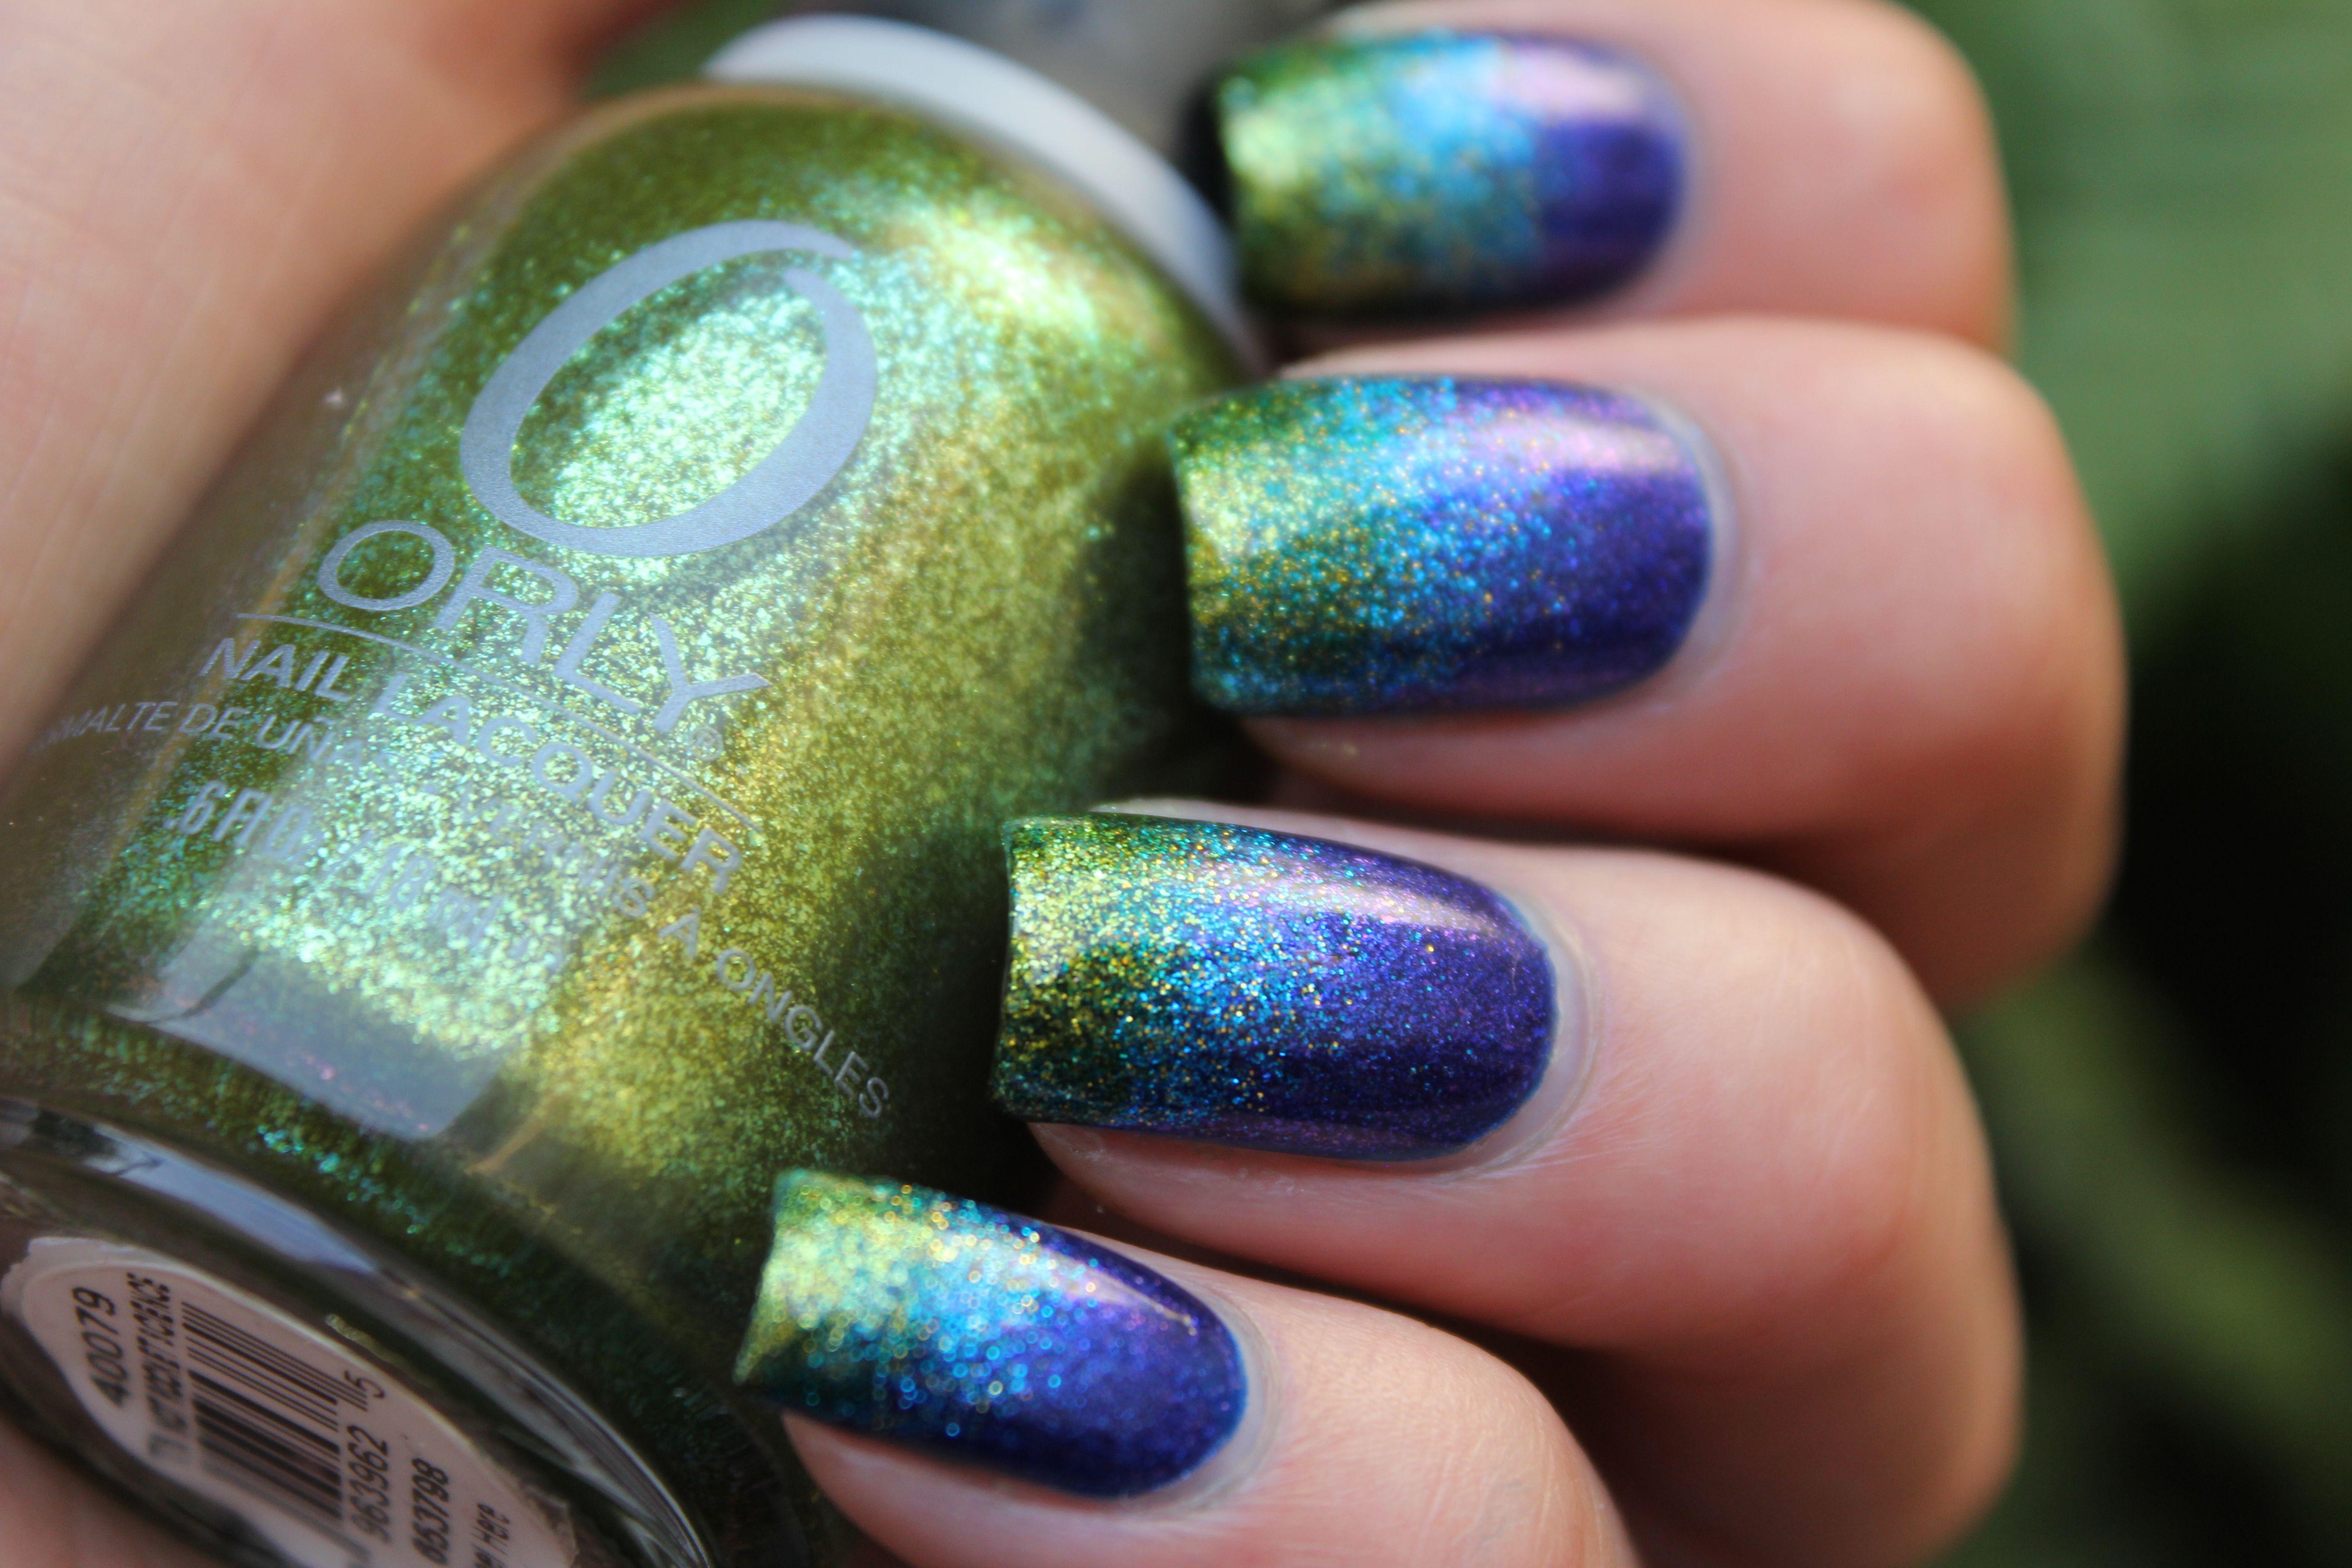 Blå/Grøn sponge gradient | Manicuras, Esmalte y Belleza